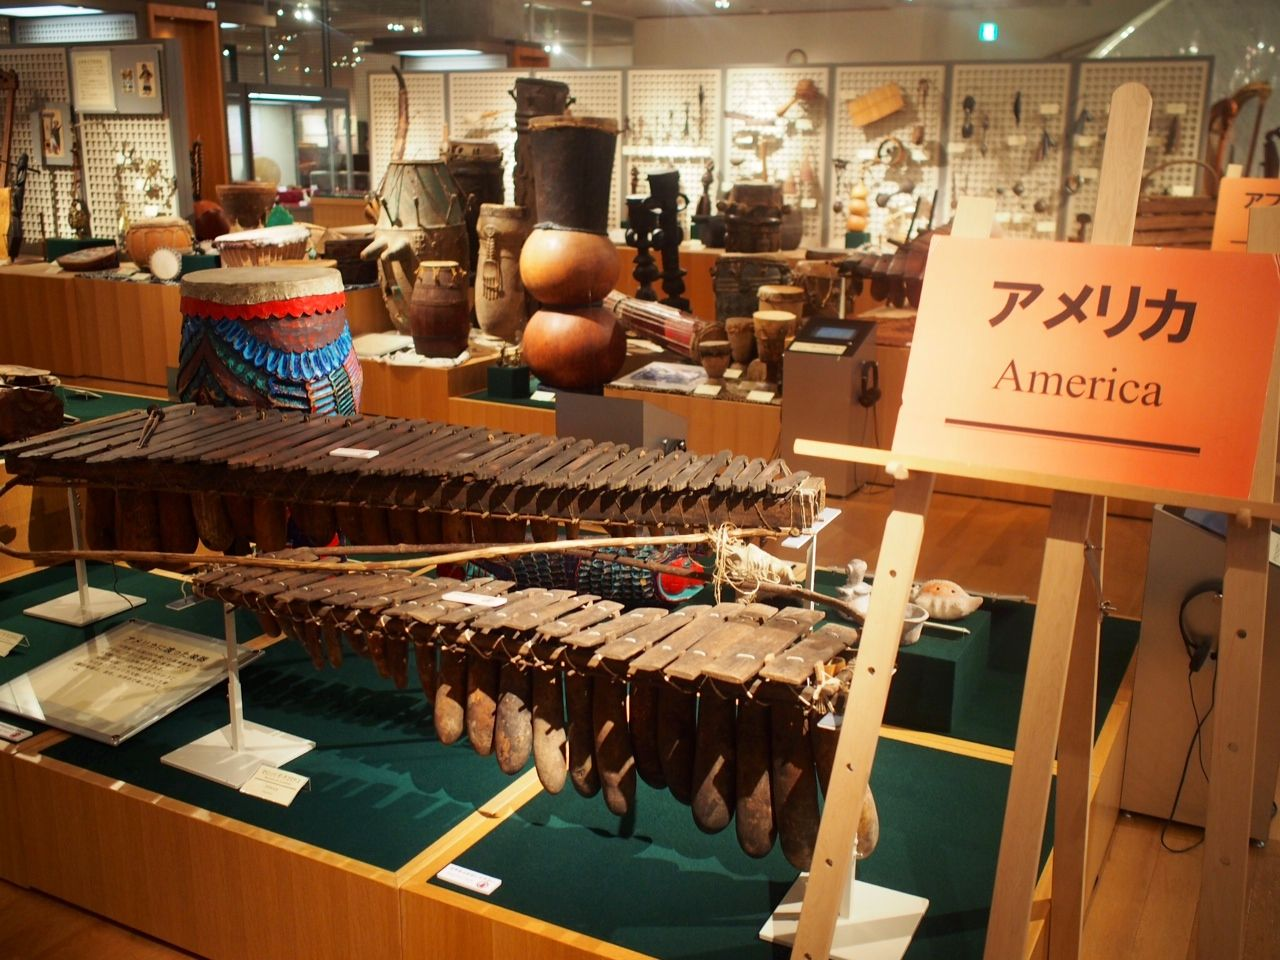 世界各地の楽器 第二展示室